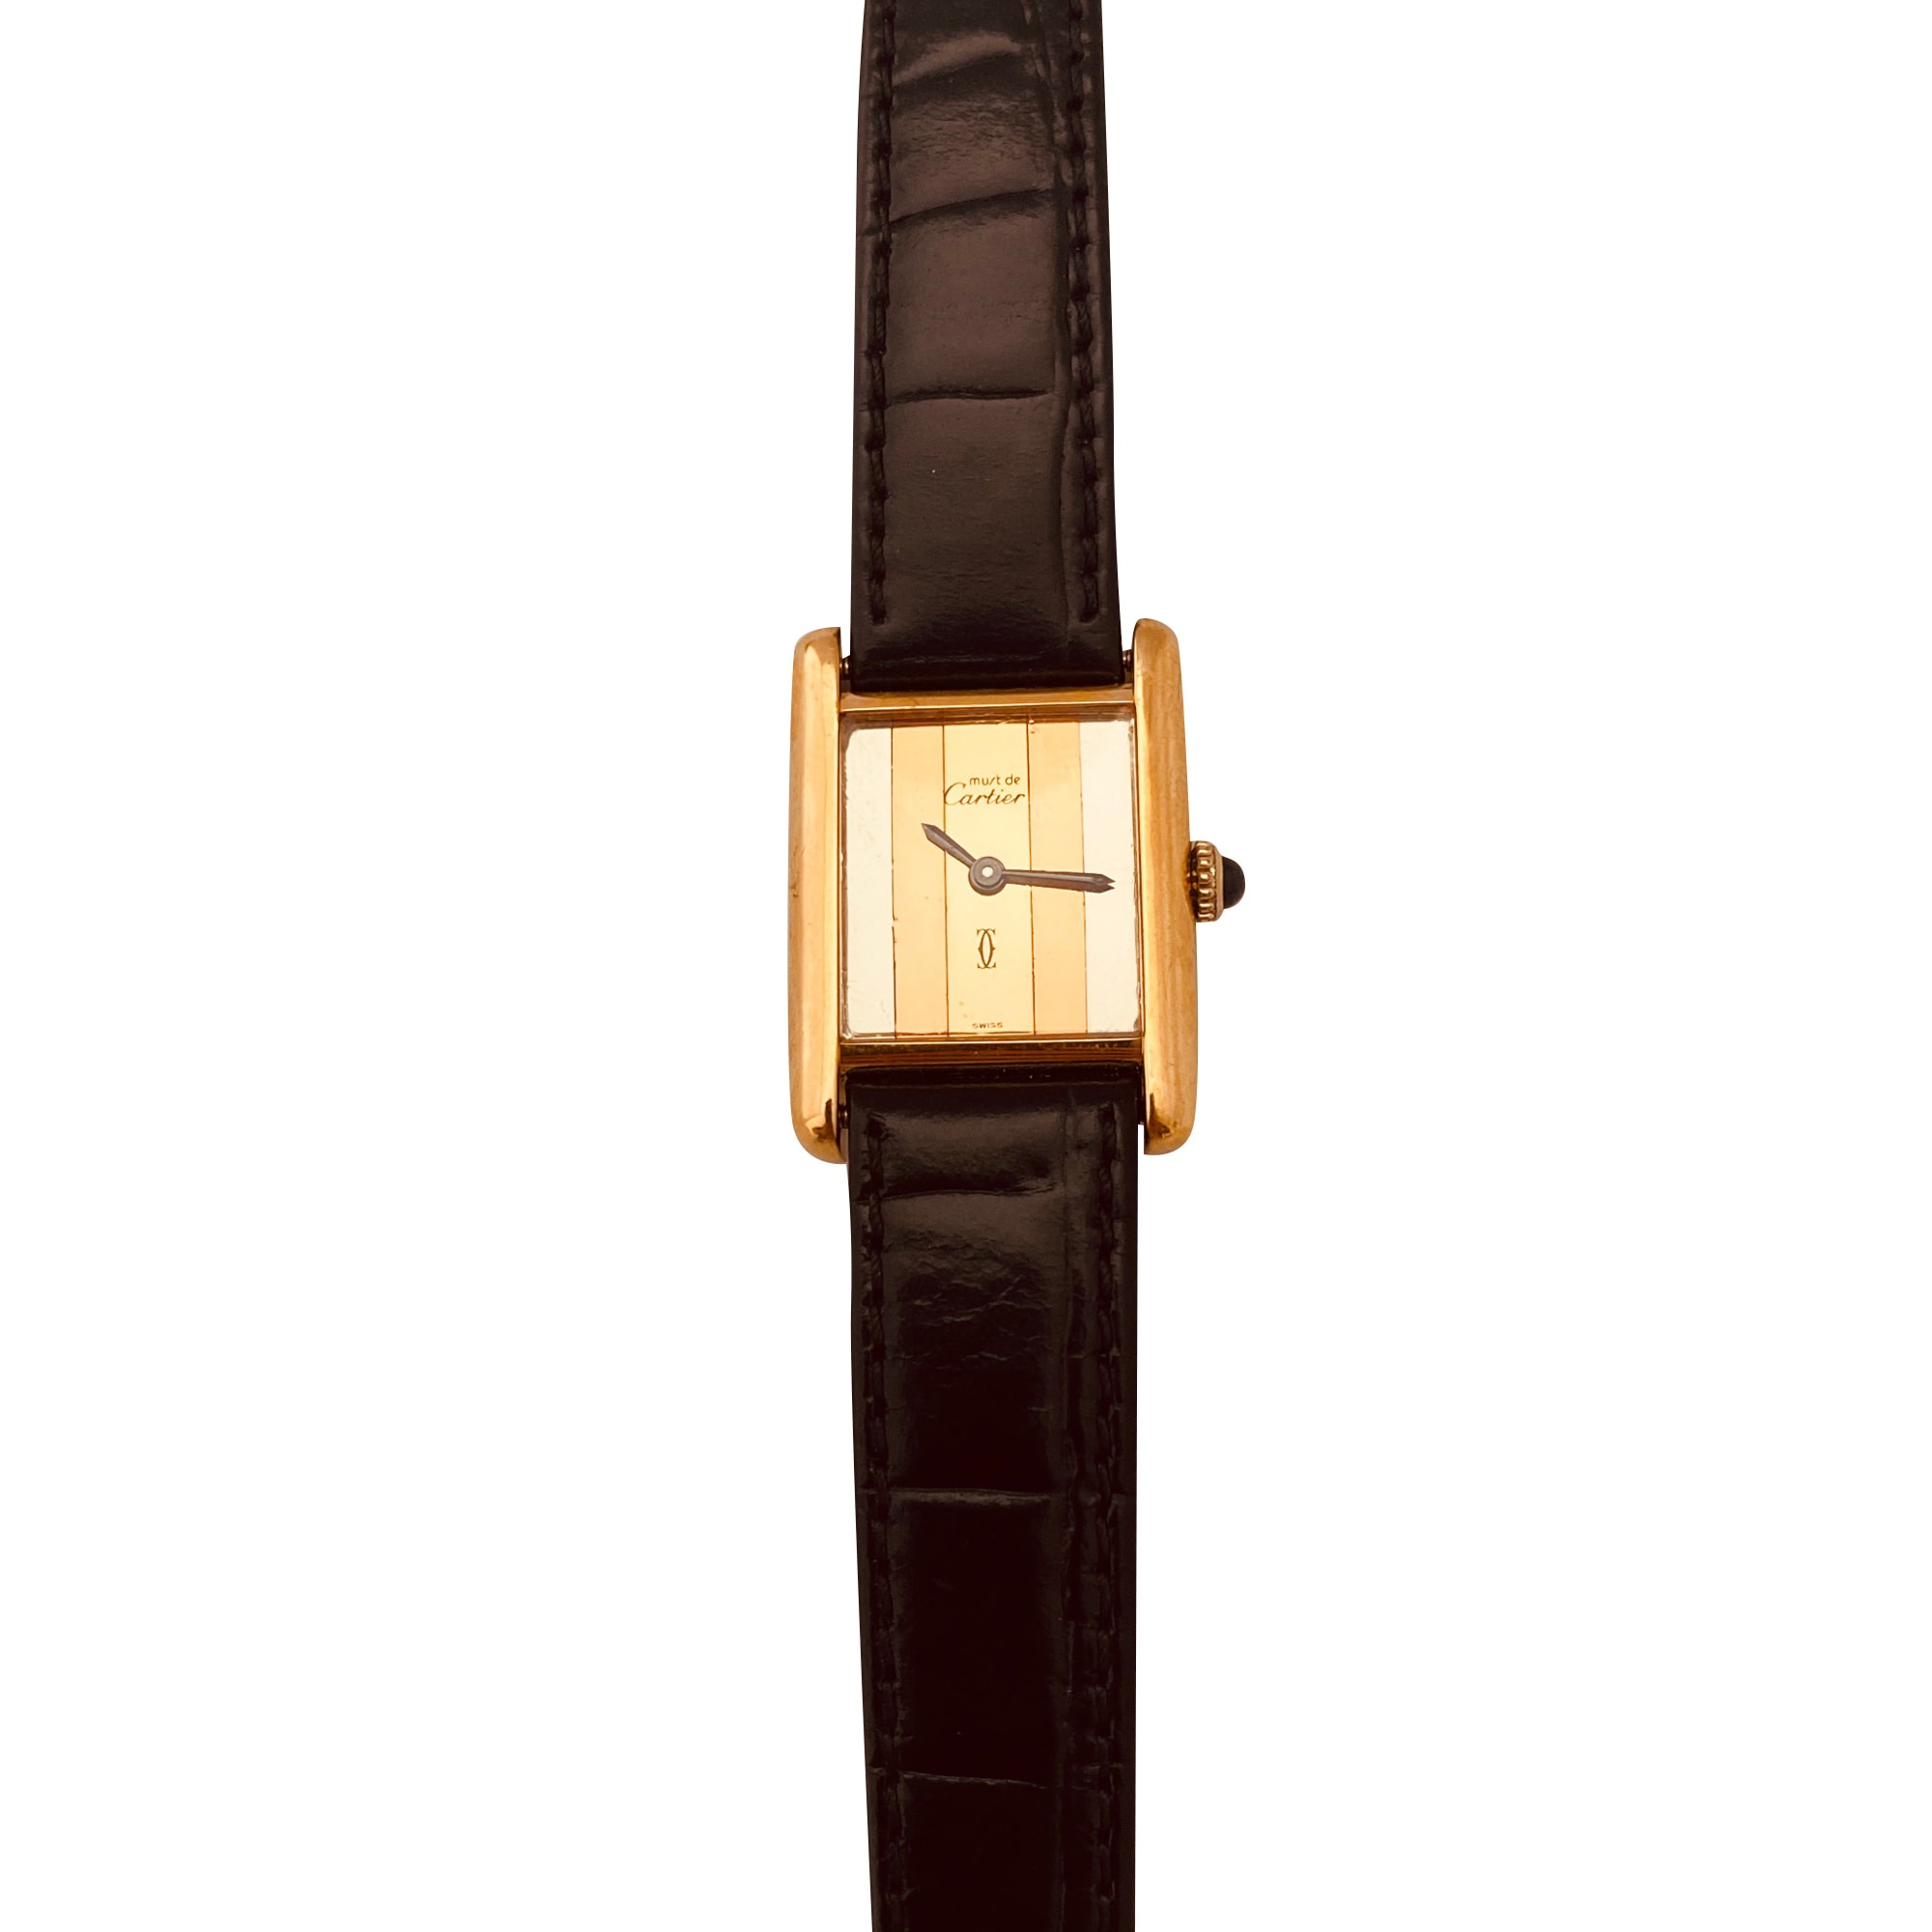 Orologio da polso CARTIER Dorato, bronzo, rame